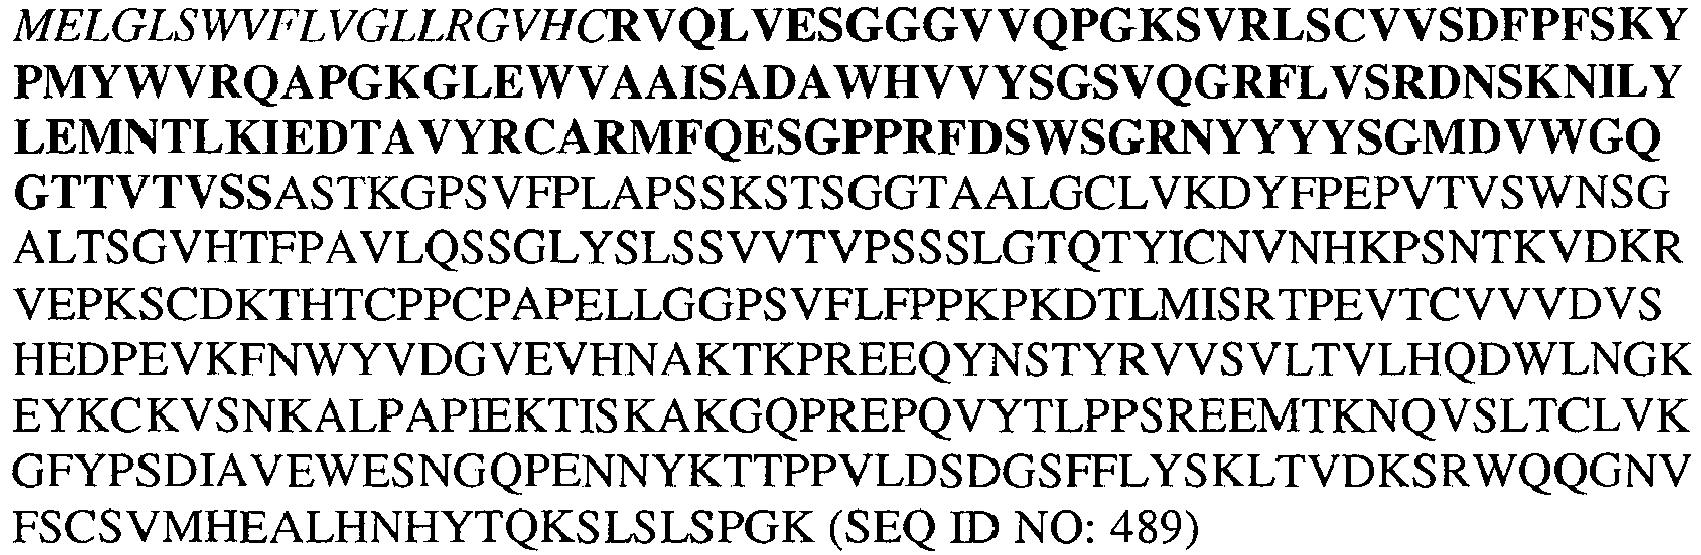 Figure imgb0366